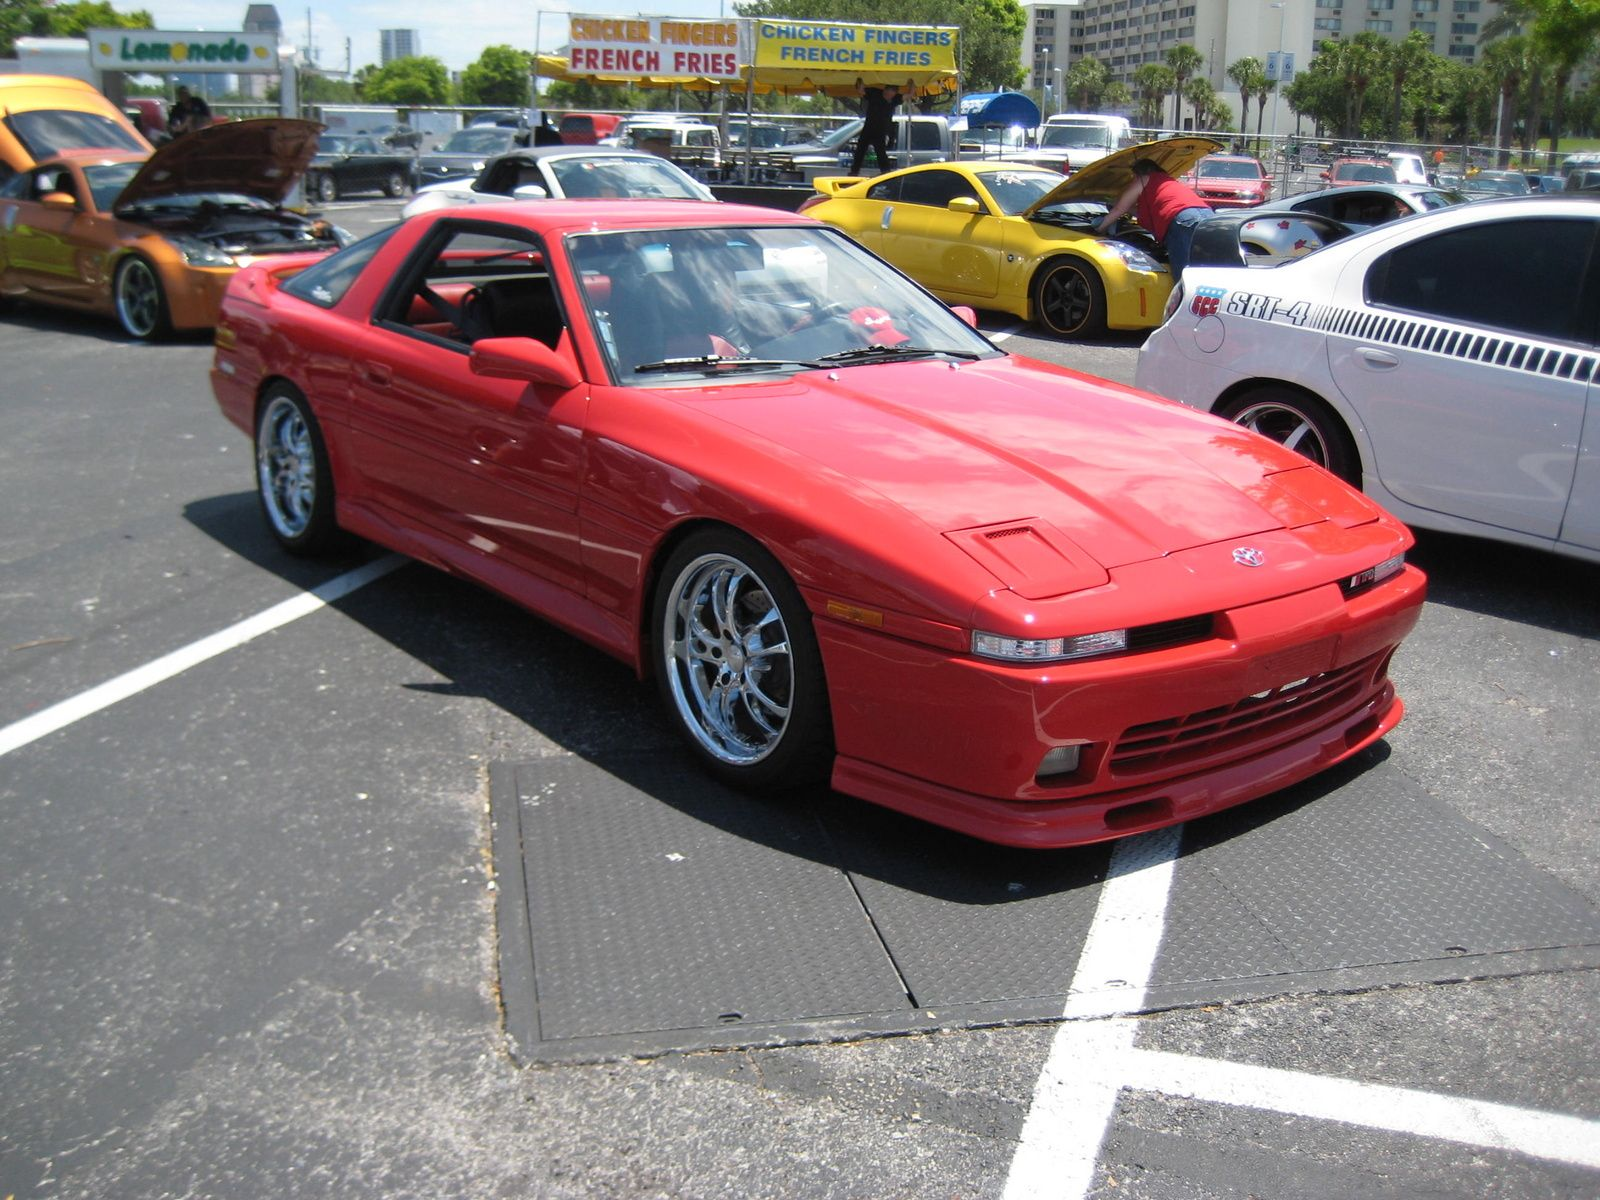 I had one of these --1992 Toyota Supra --red, targa top, twin turbo ...